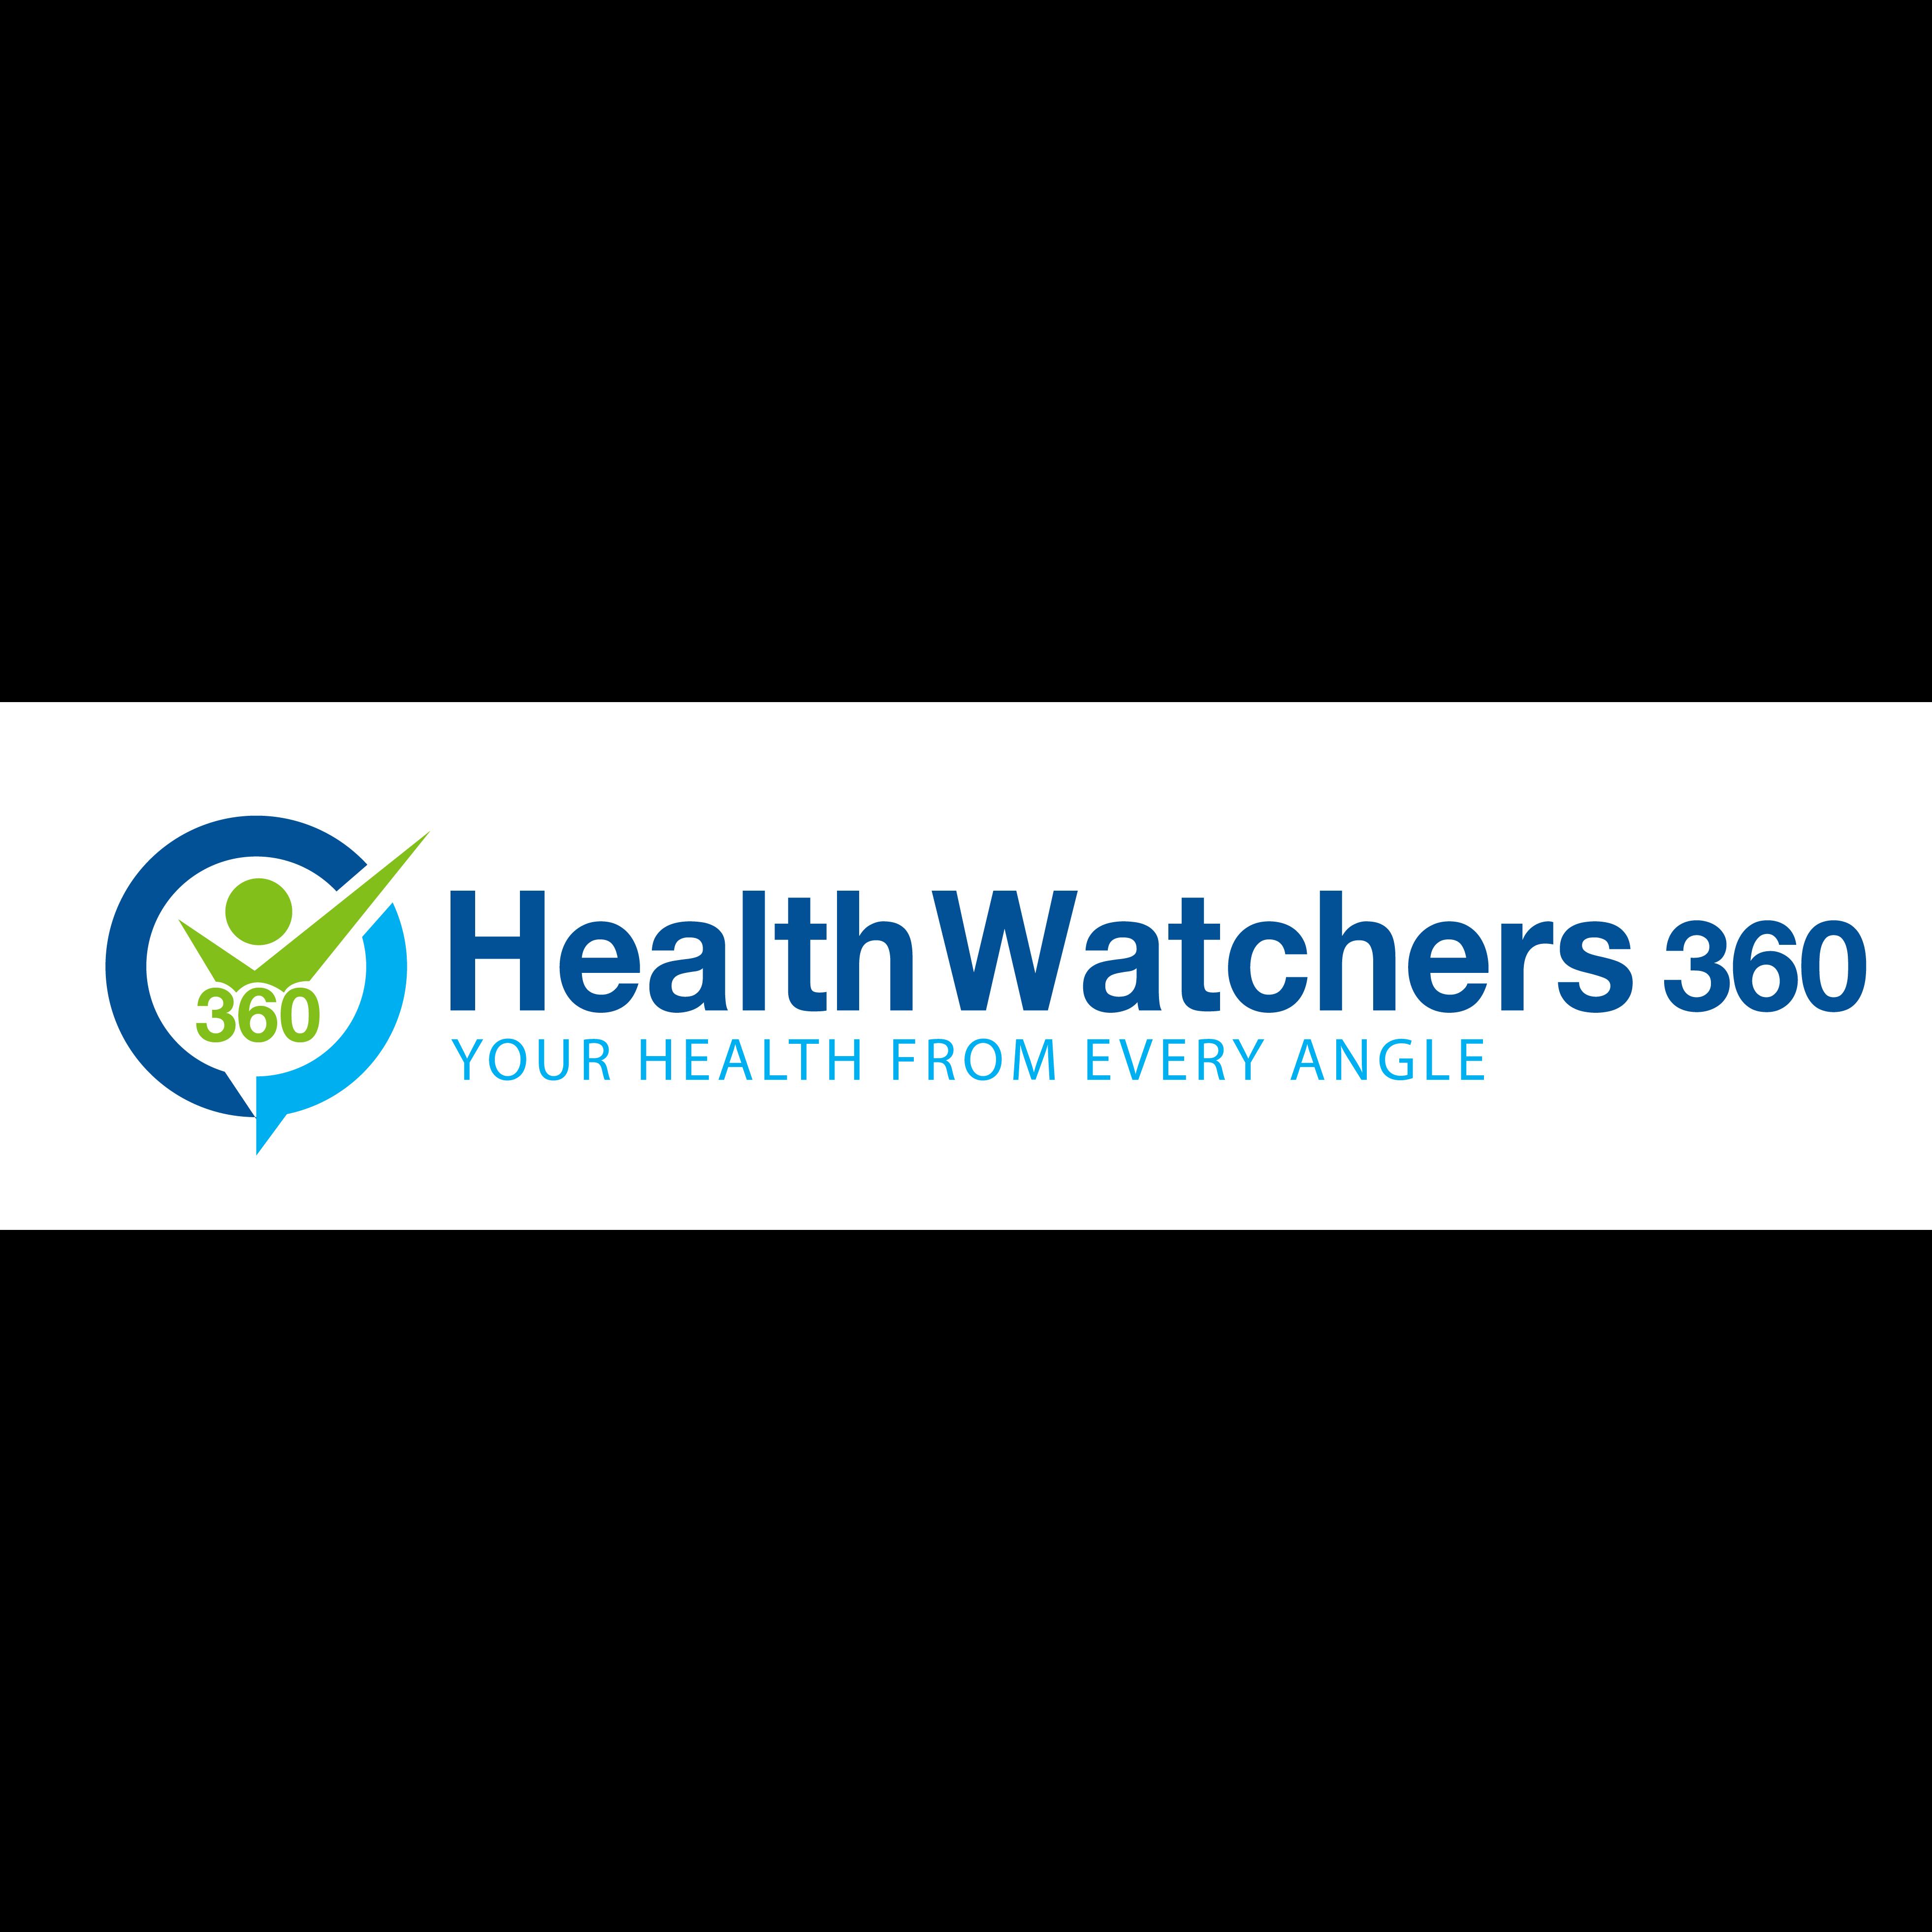 Healthwatchers 360